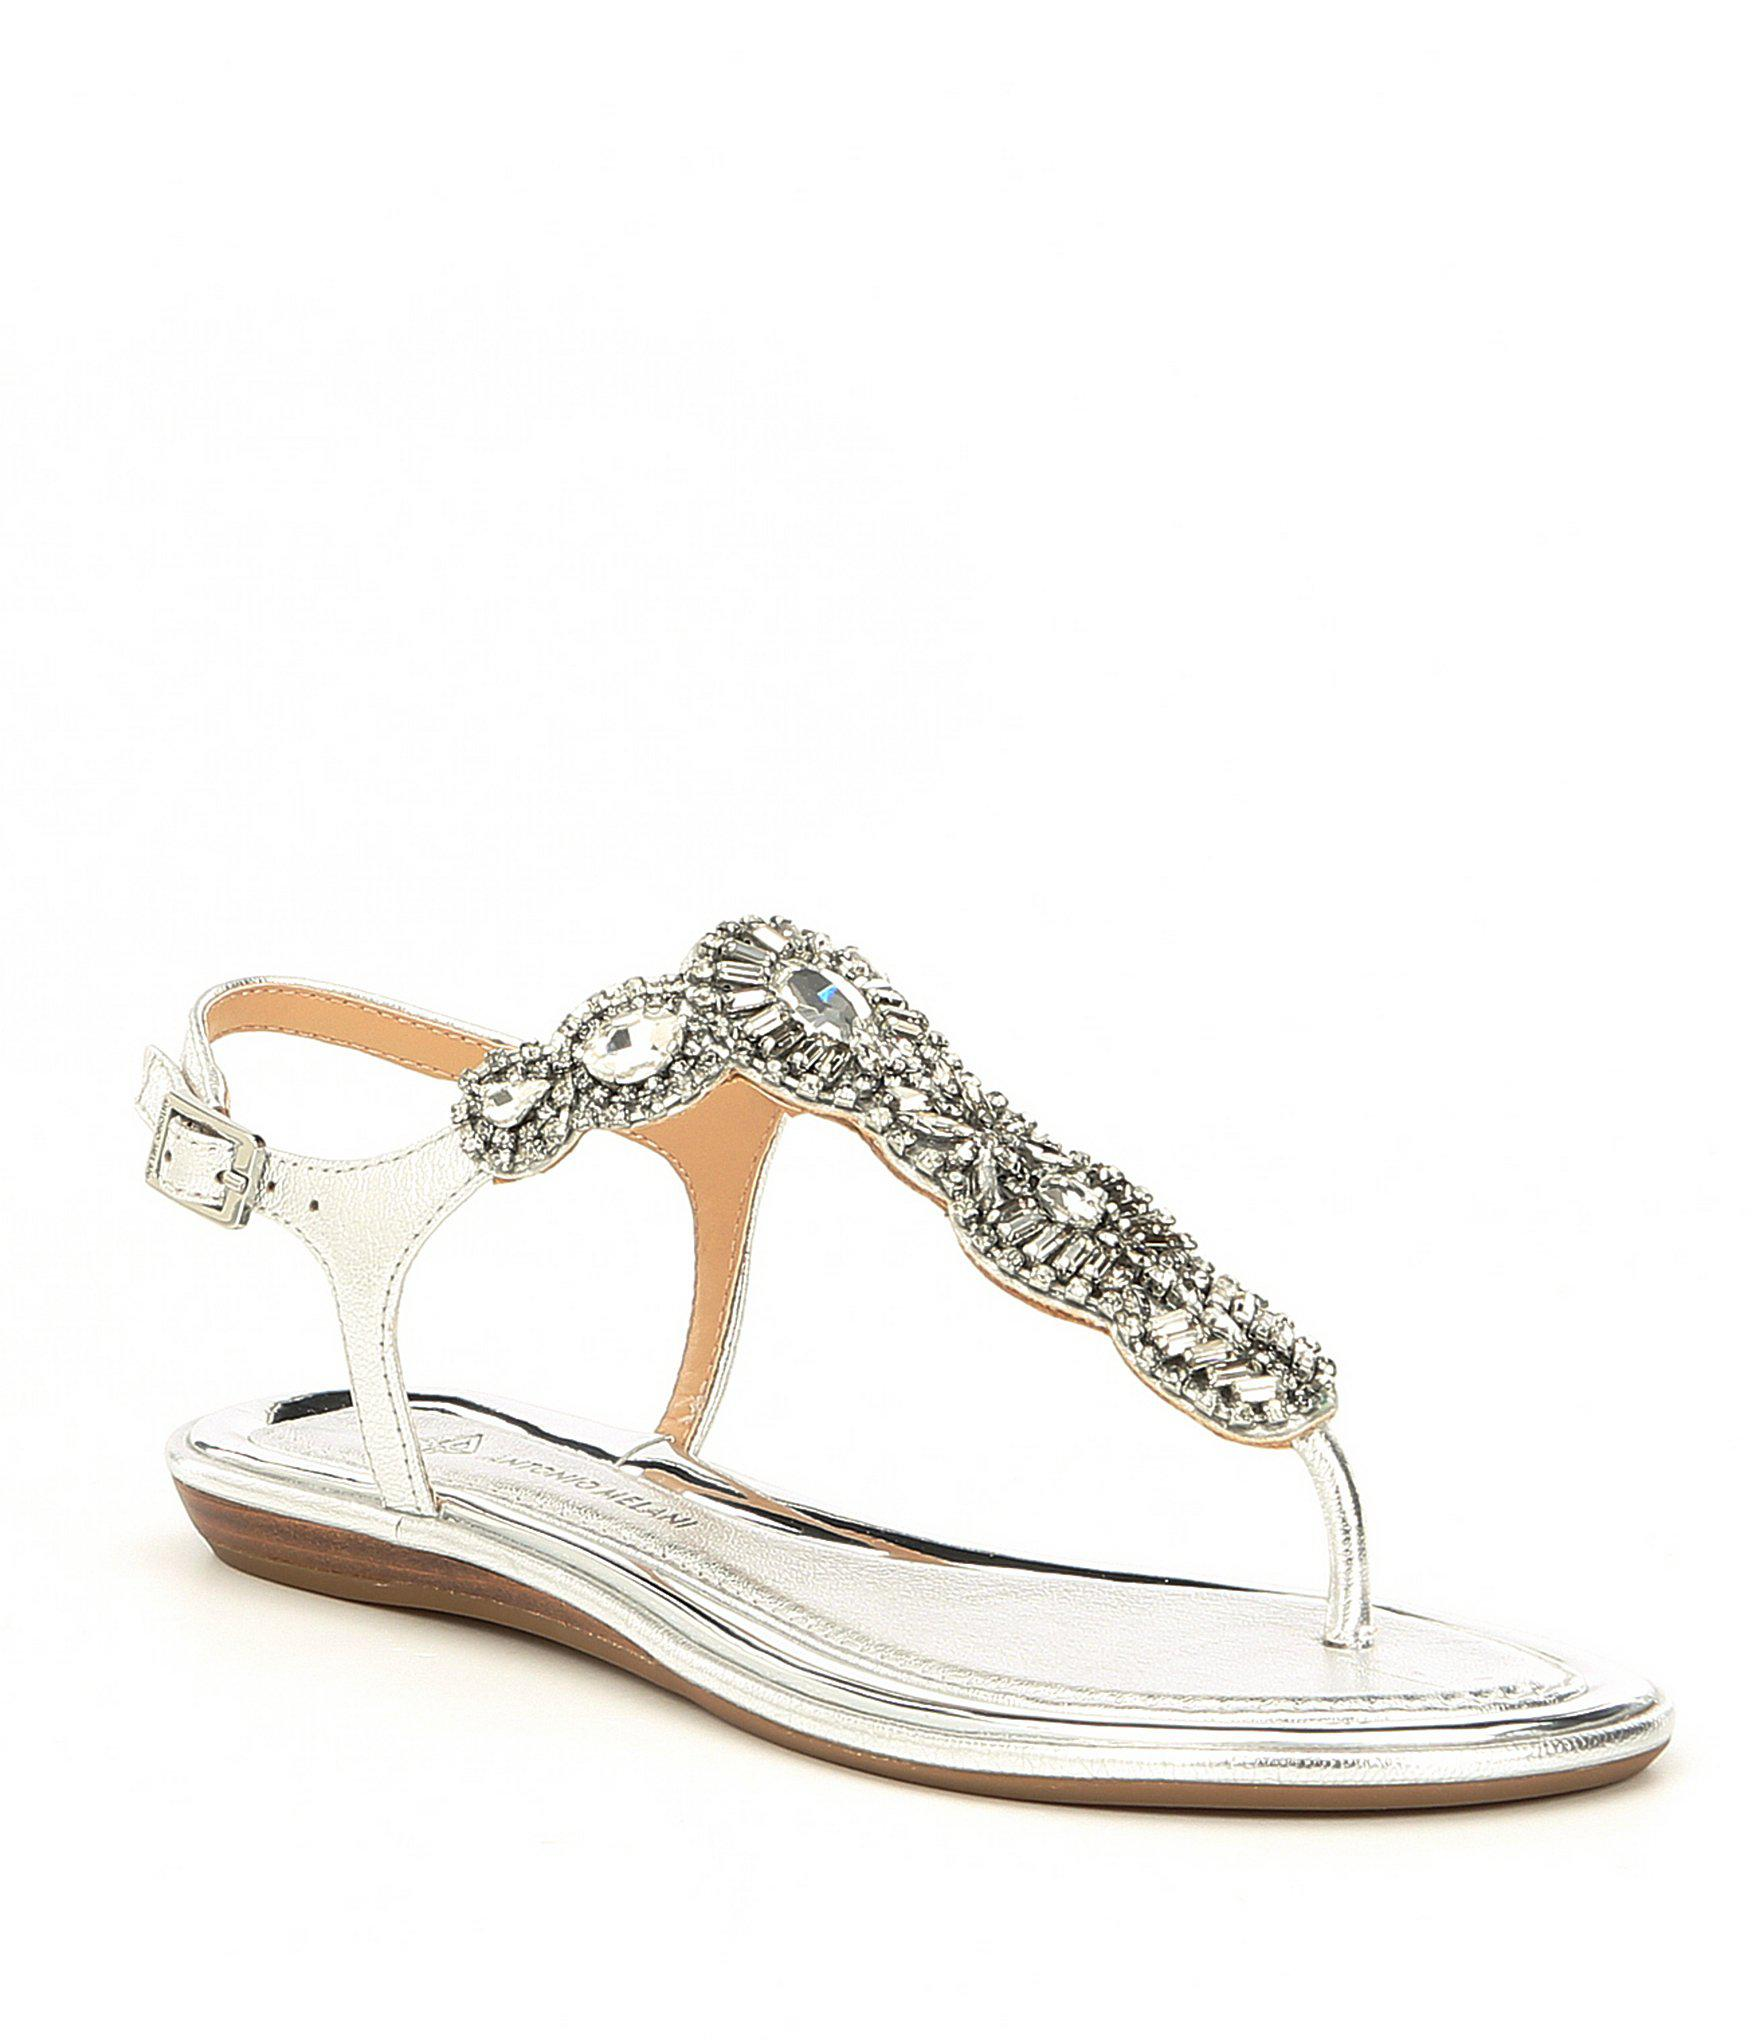 7865f8ded983 Lyst - Antonio Melani Santine Rhinestone Embellished Thong Sandals ...